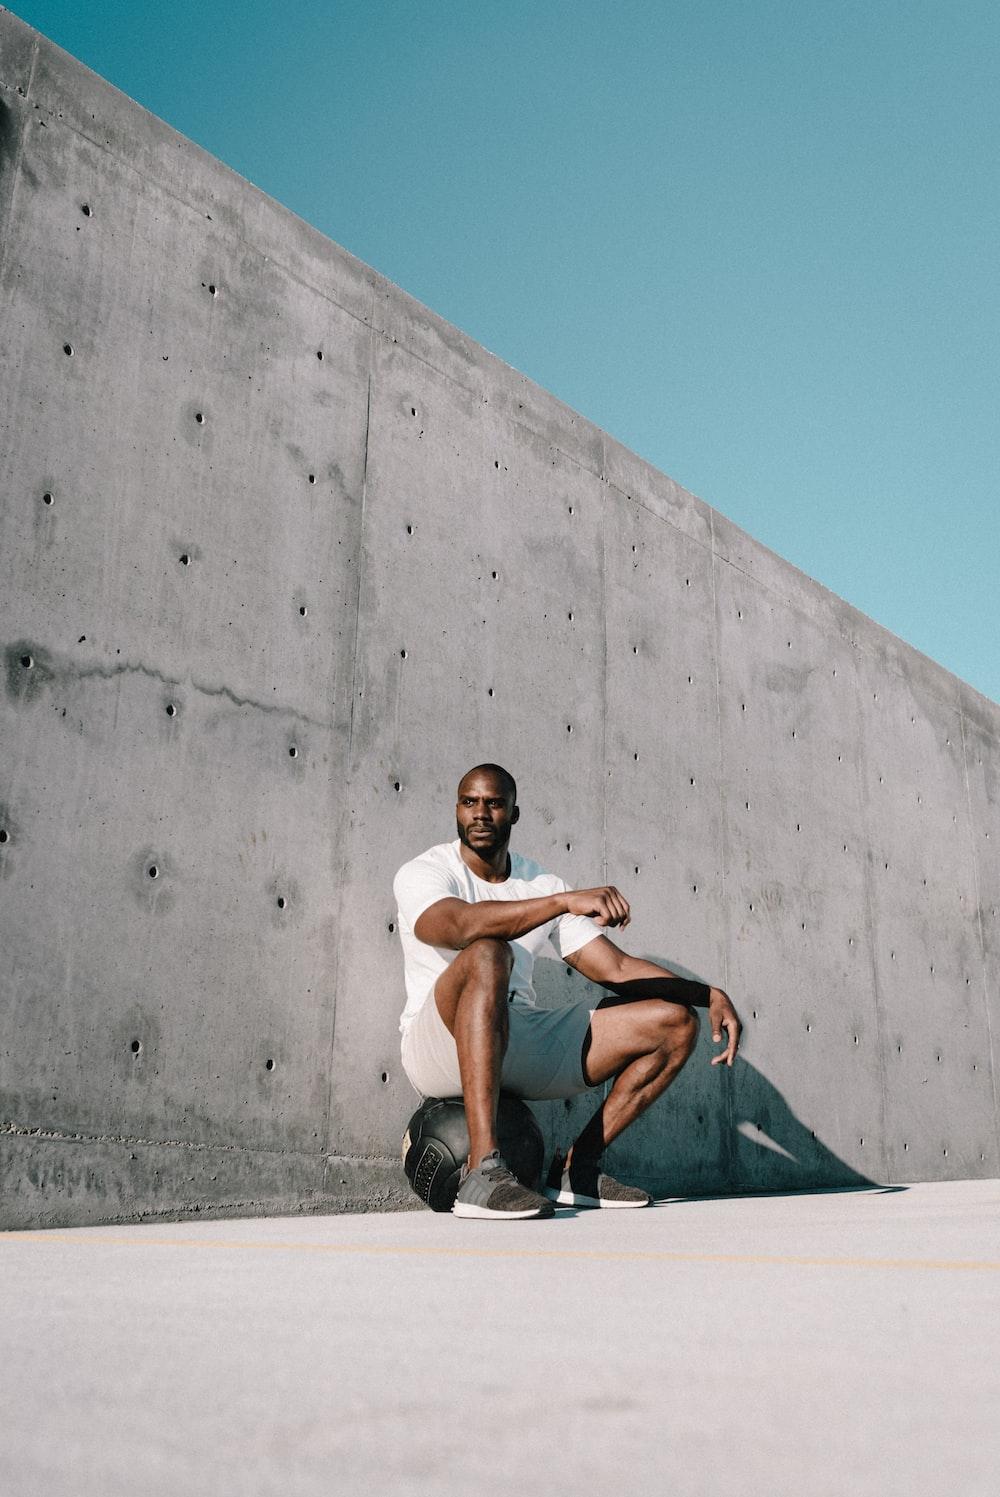 man in white t-shirt and black shorts sitting on black skateboard